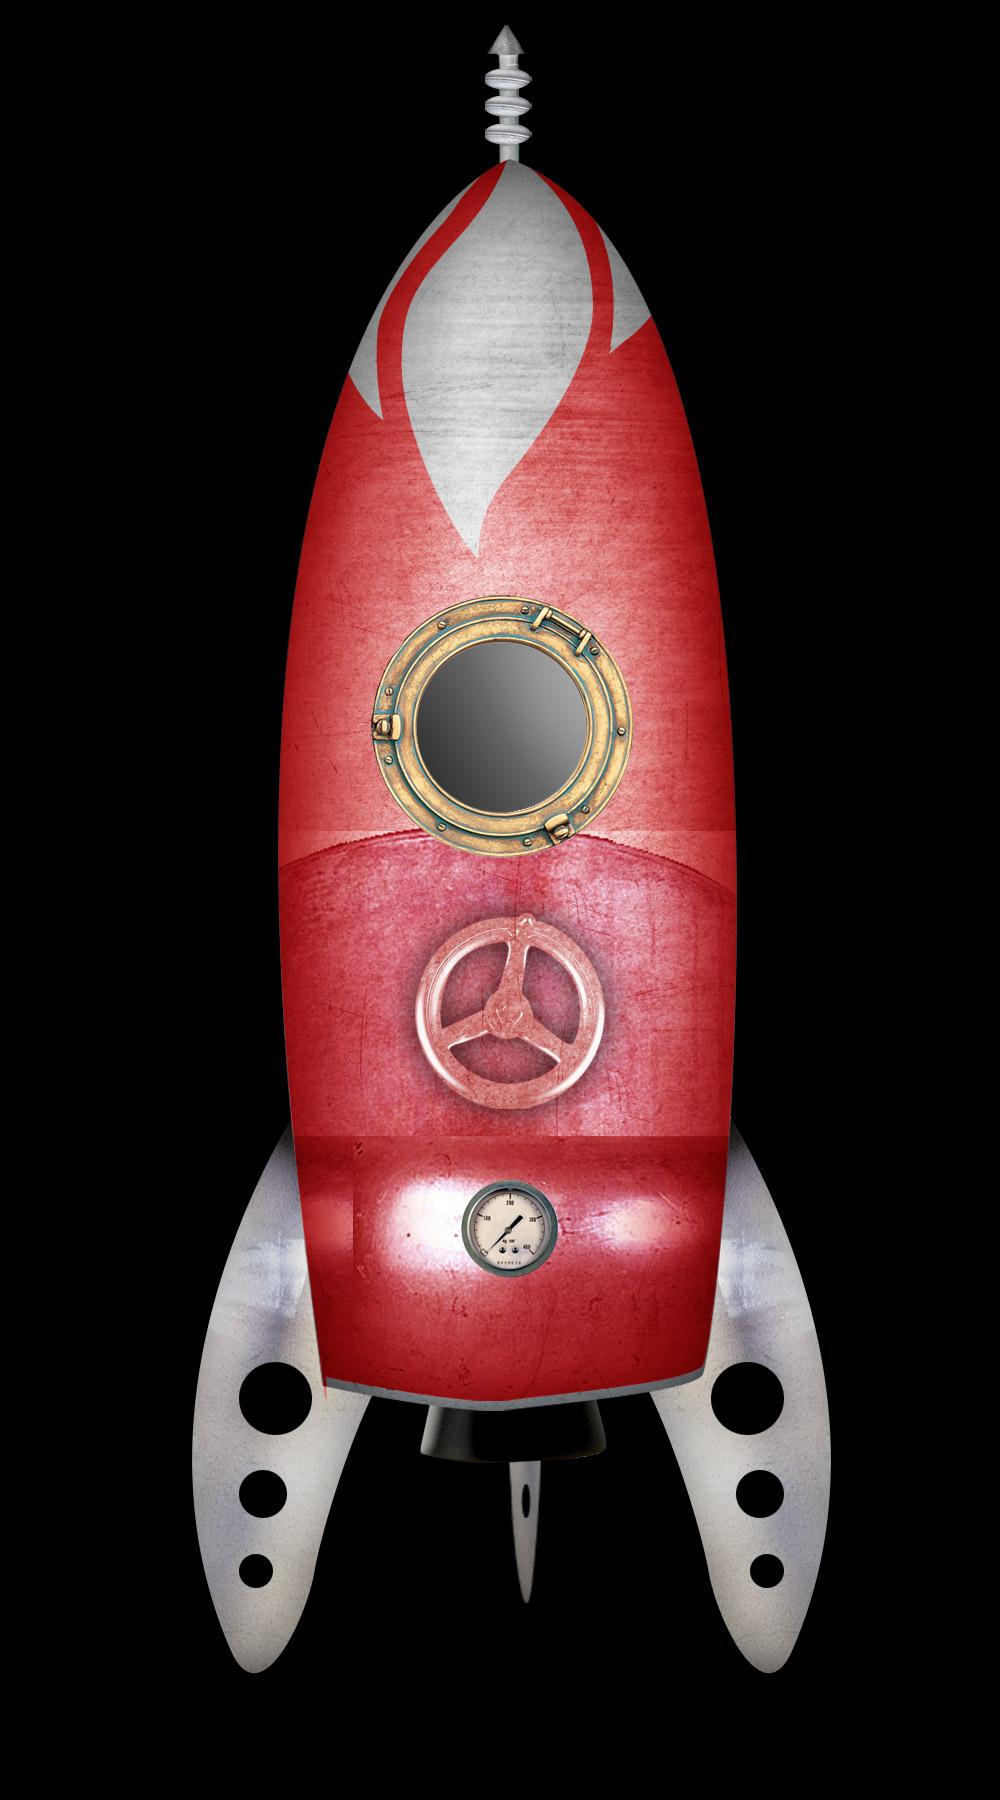 final rocket design